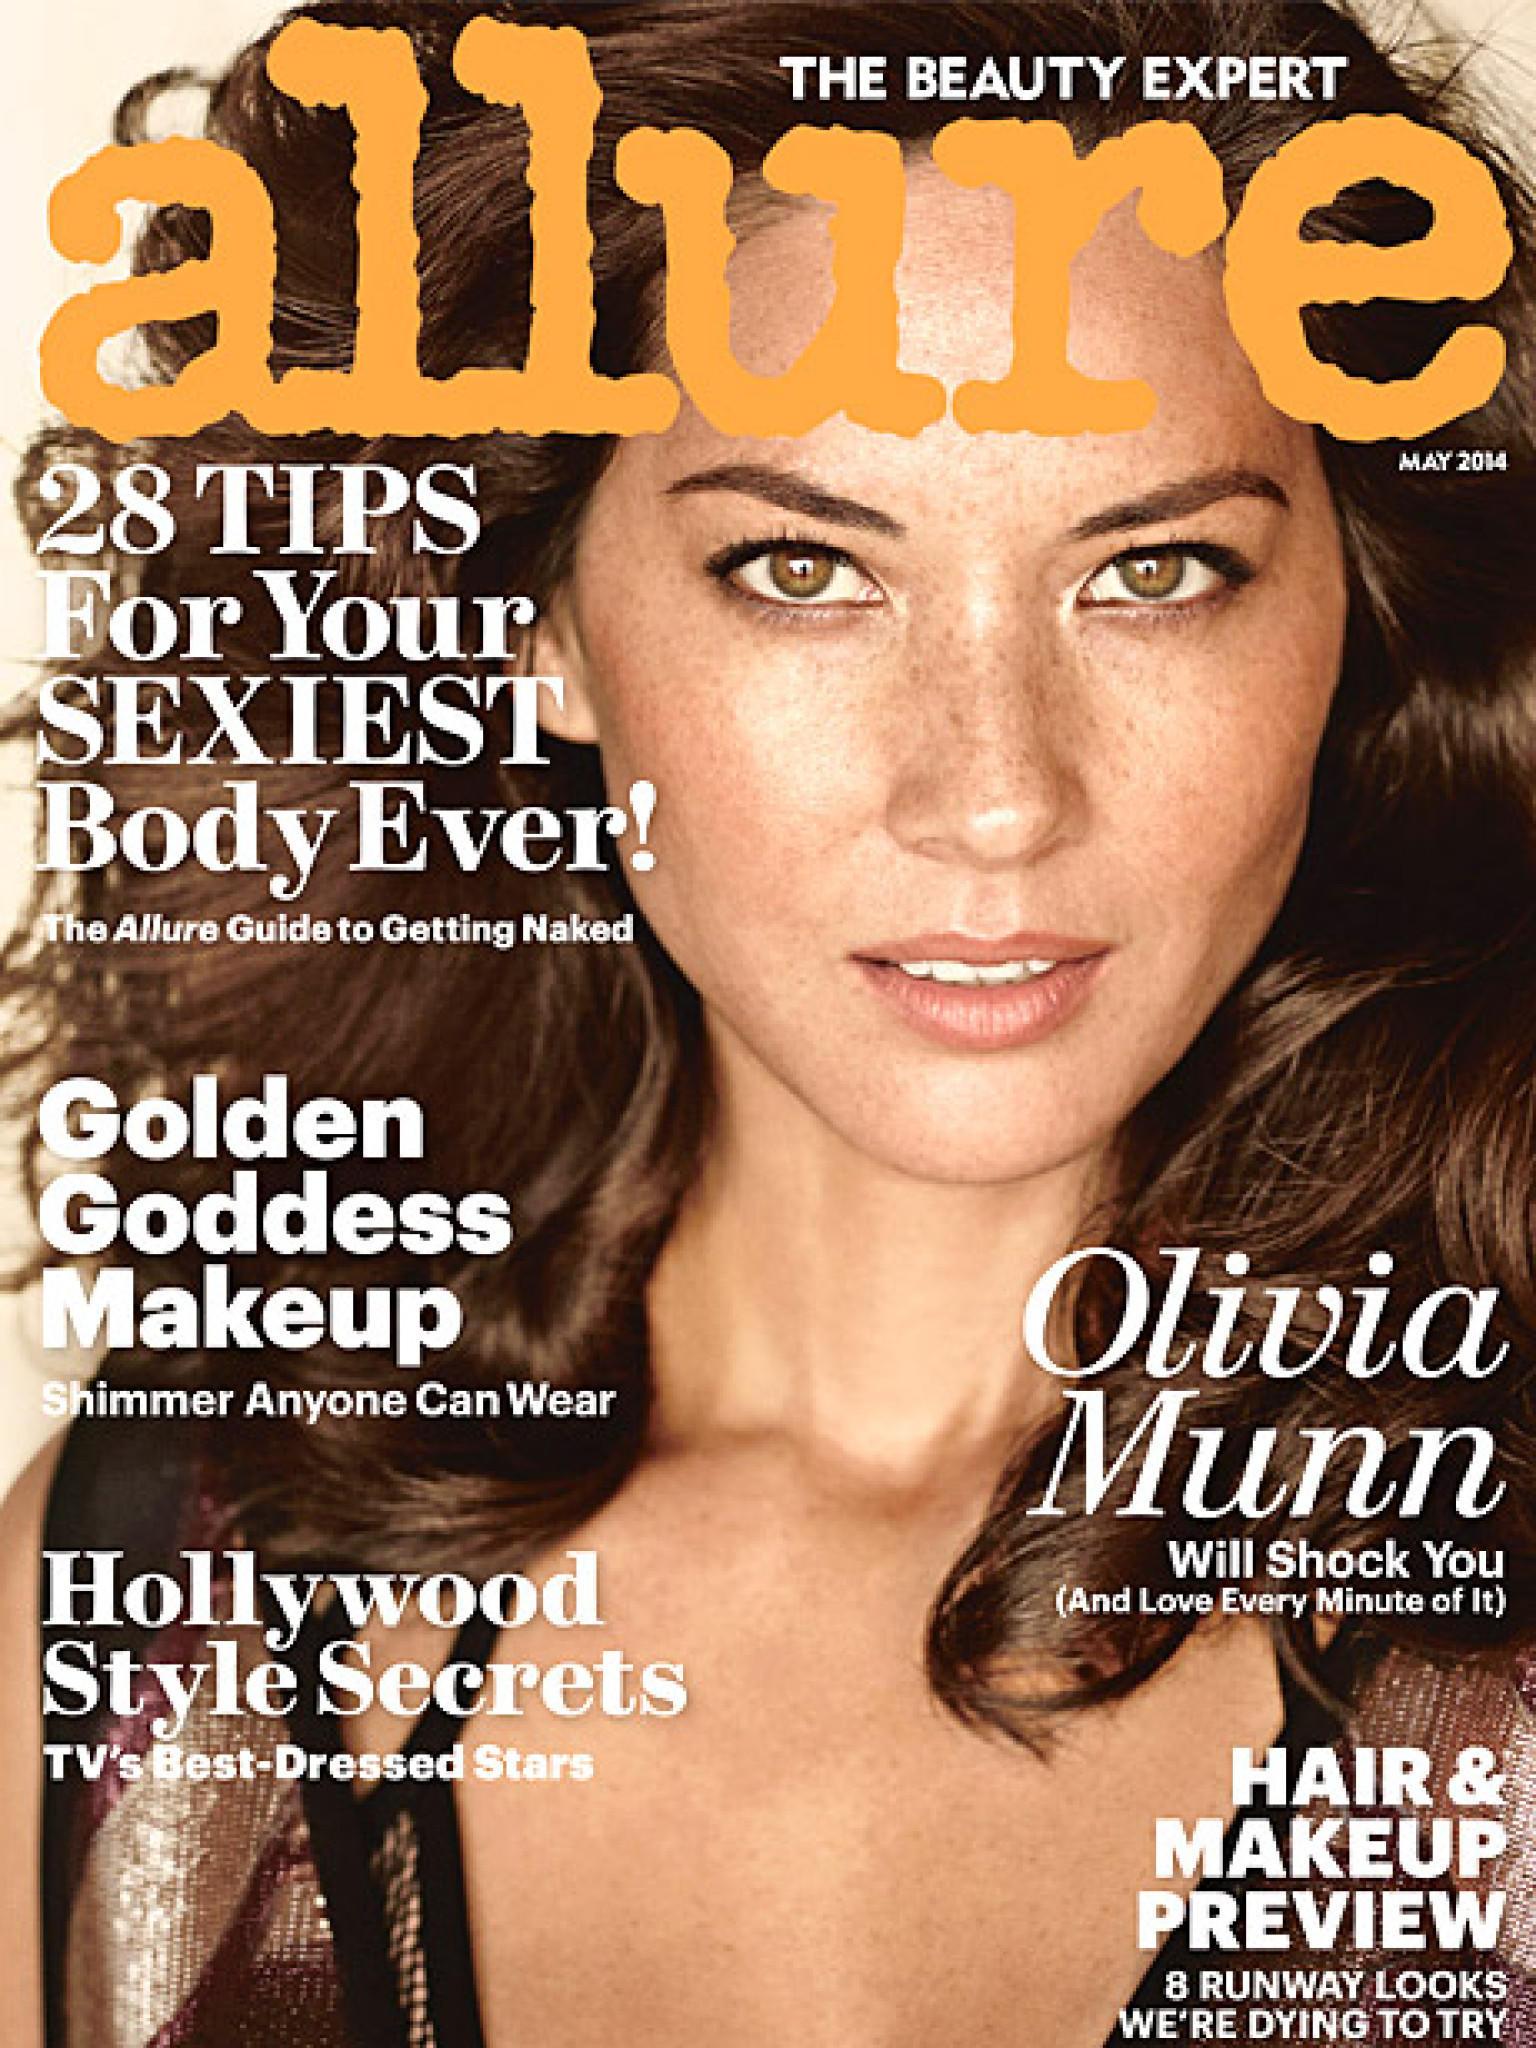 Nacktfotoshooting: Hier lassen Hollywoods schönste Mamis